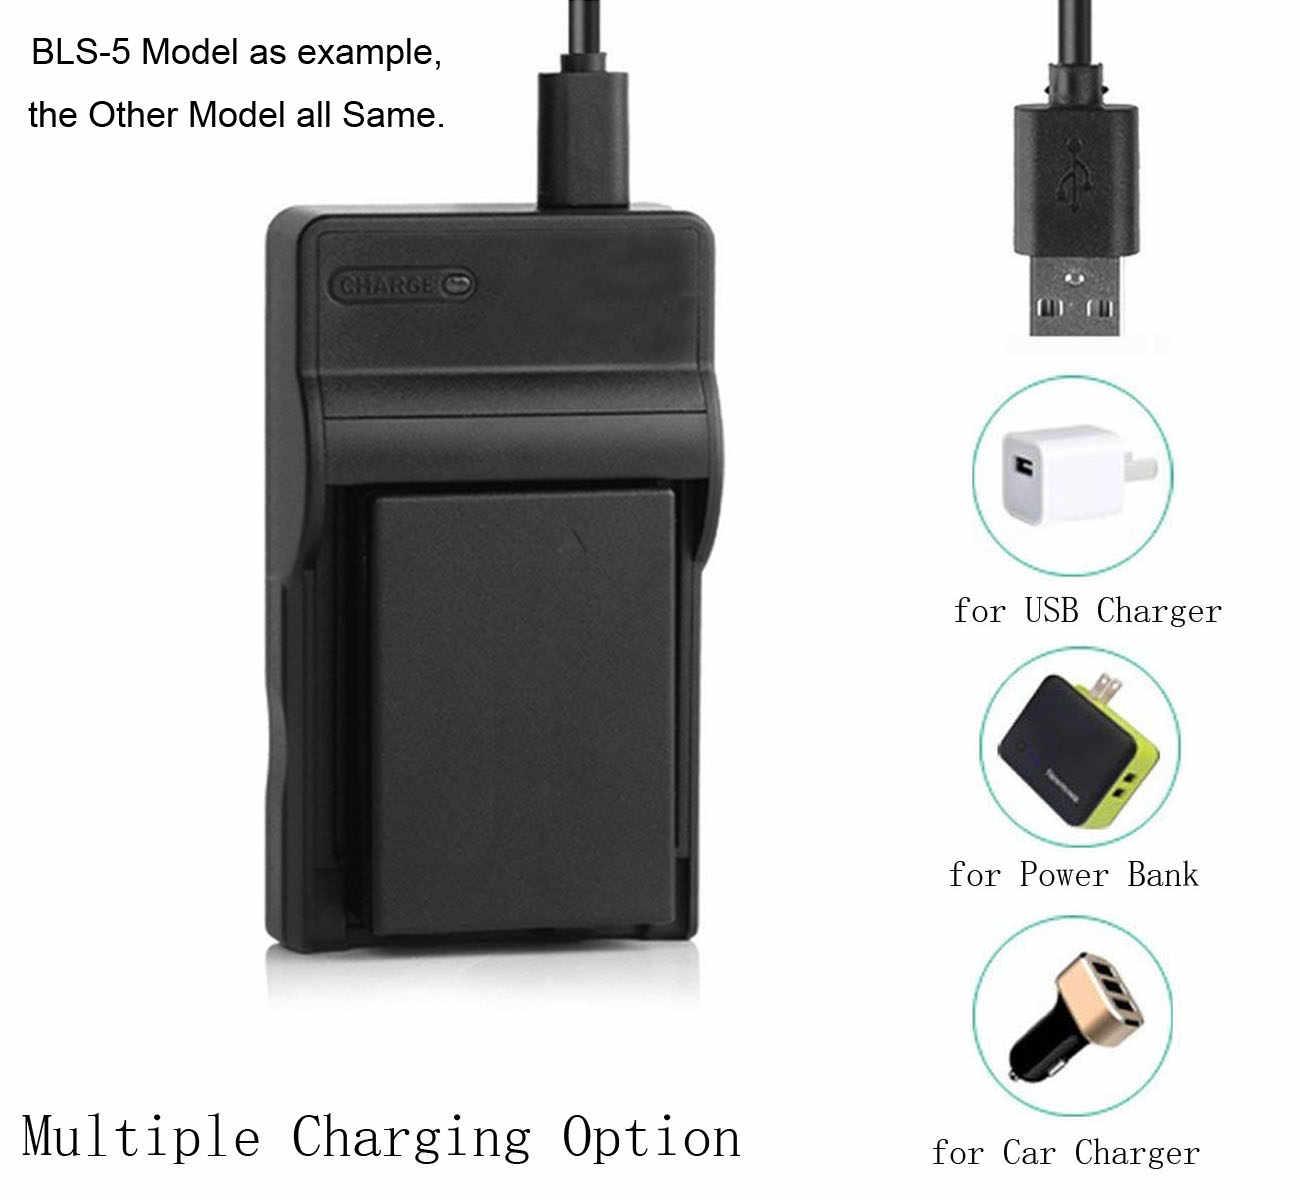 Battery Charger for Samsung SC-D70 SC-D75 SC-D73 SC-D77 Digital Video Camcorder SC-D71